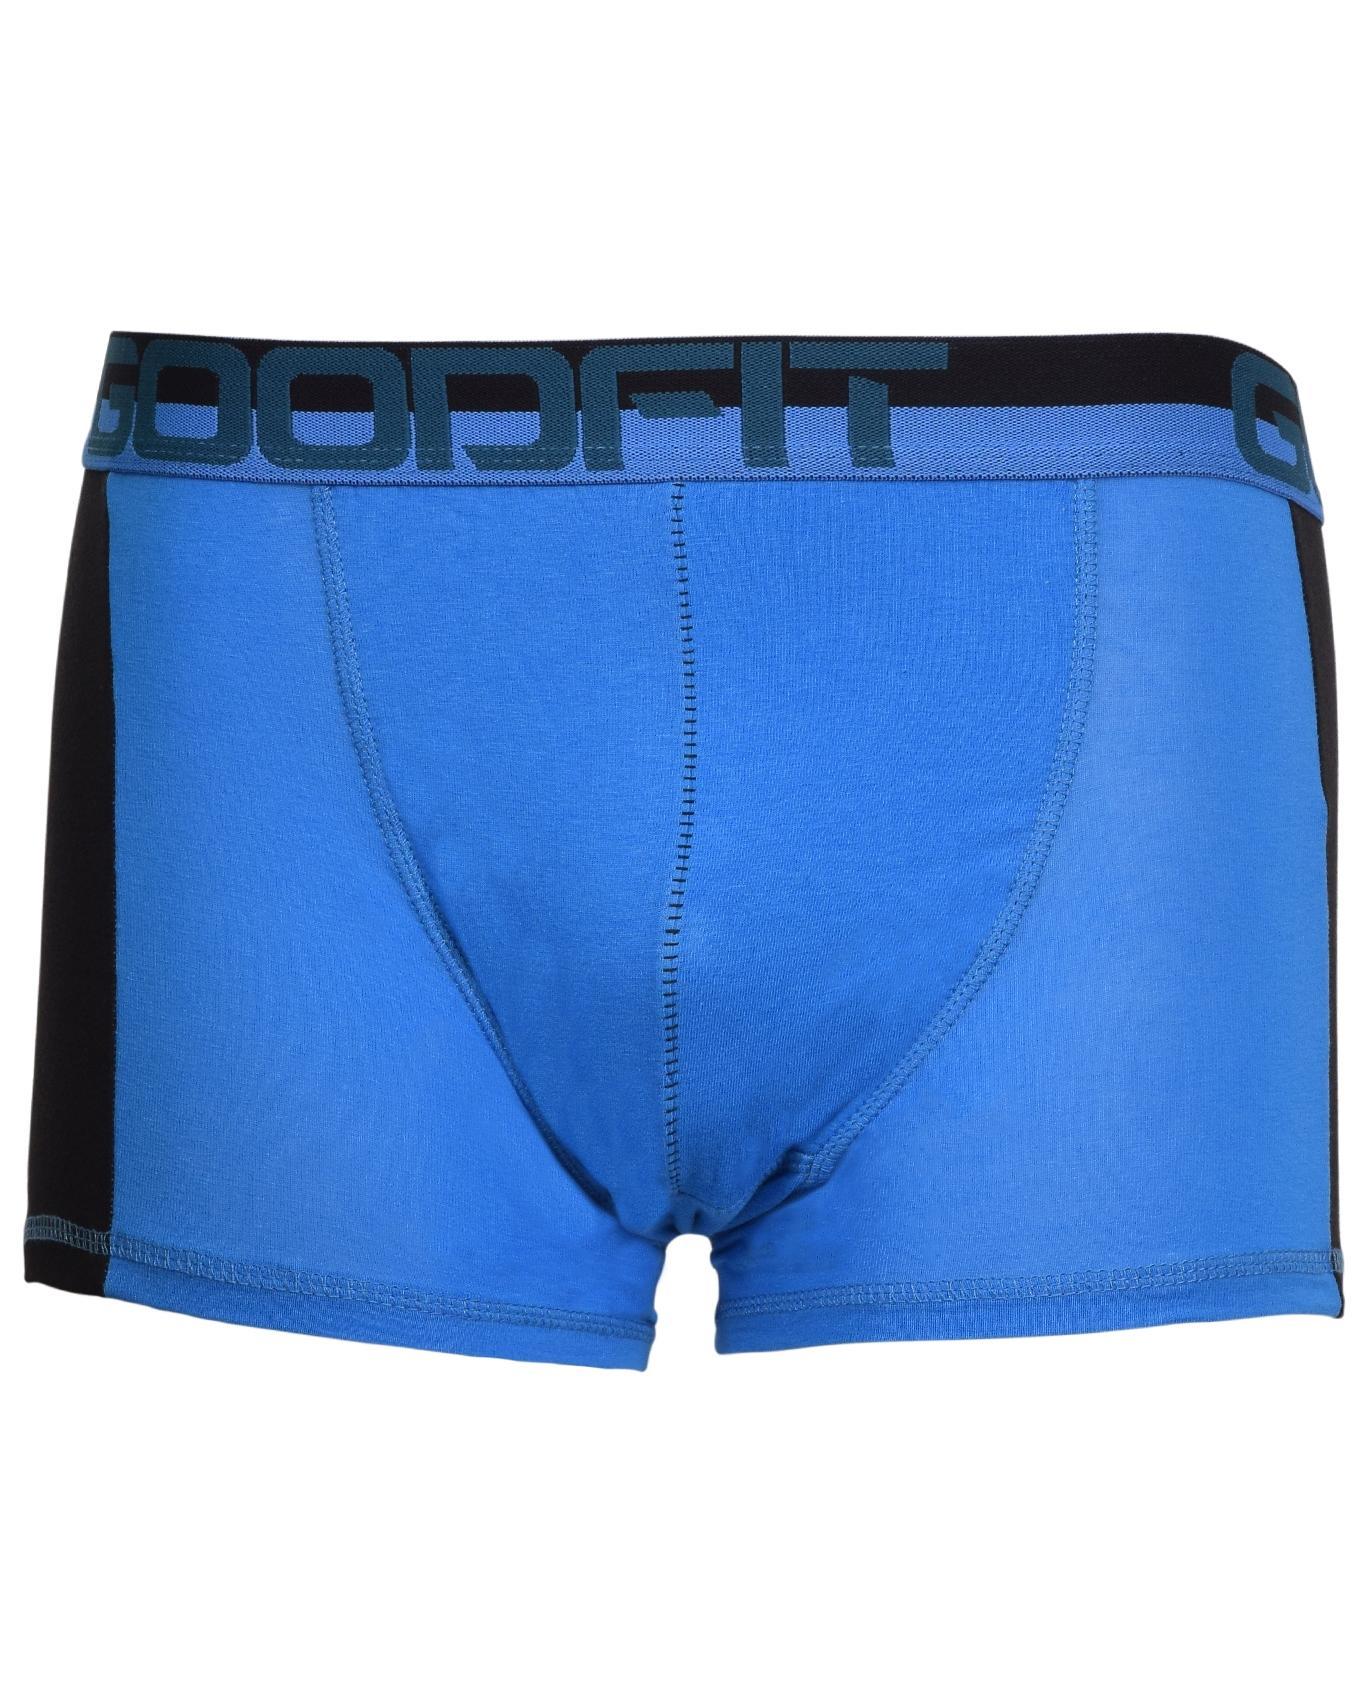 Pack Of 2 Men's Steel Boxer Brief -Sky Blue